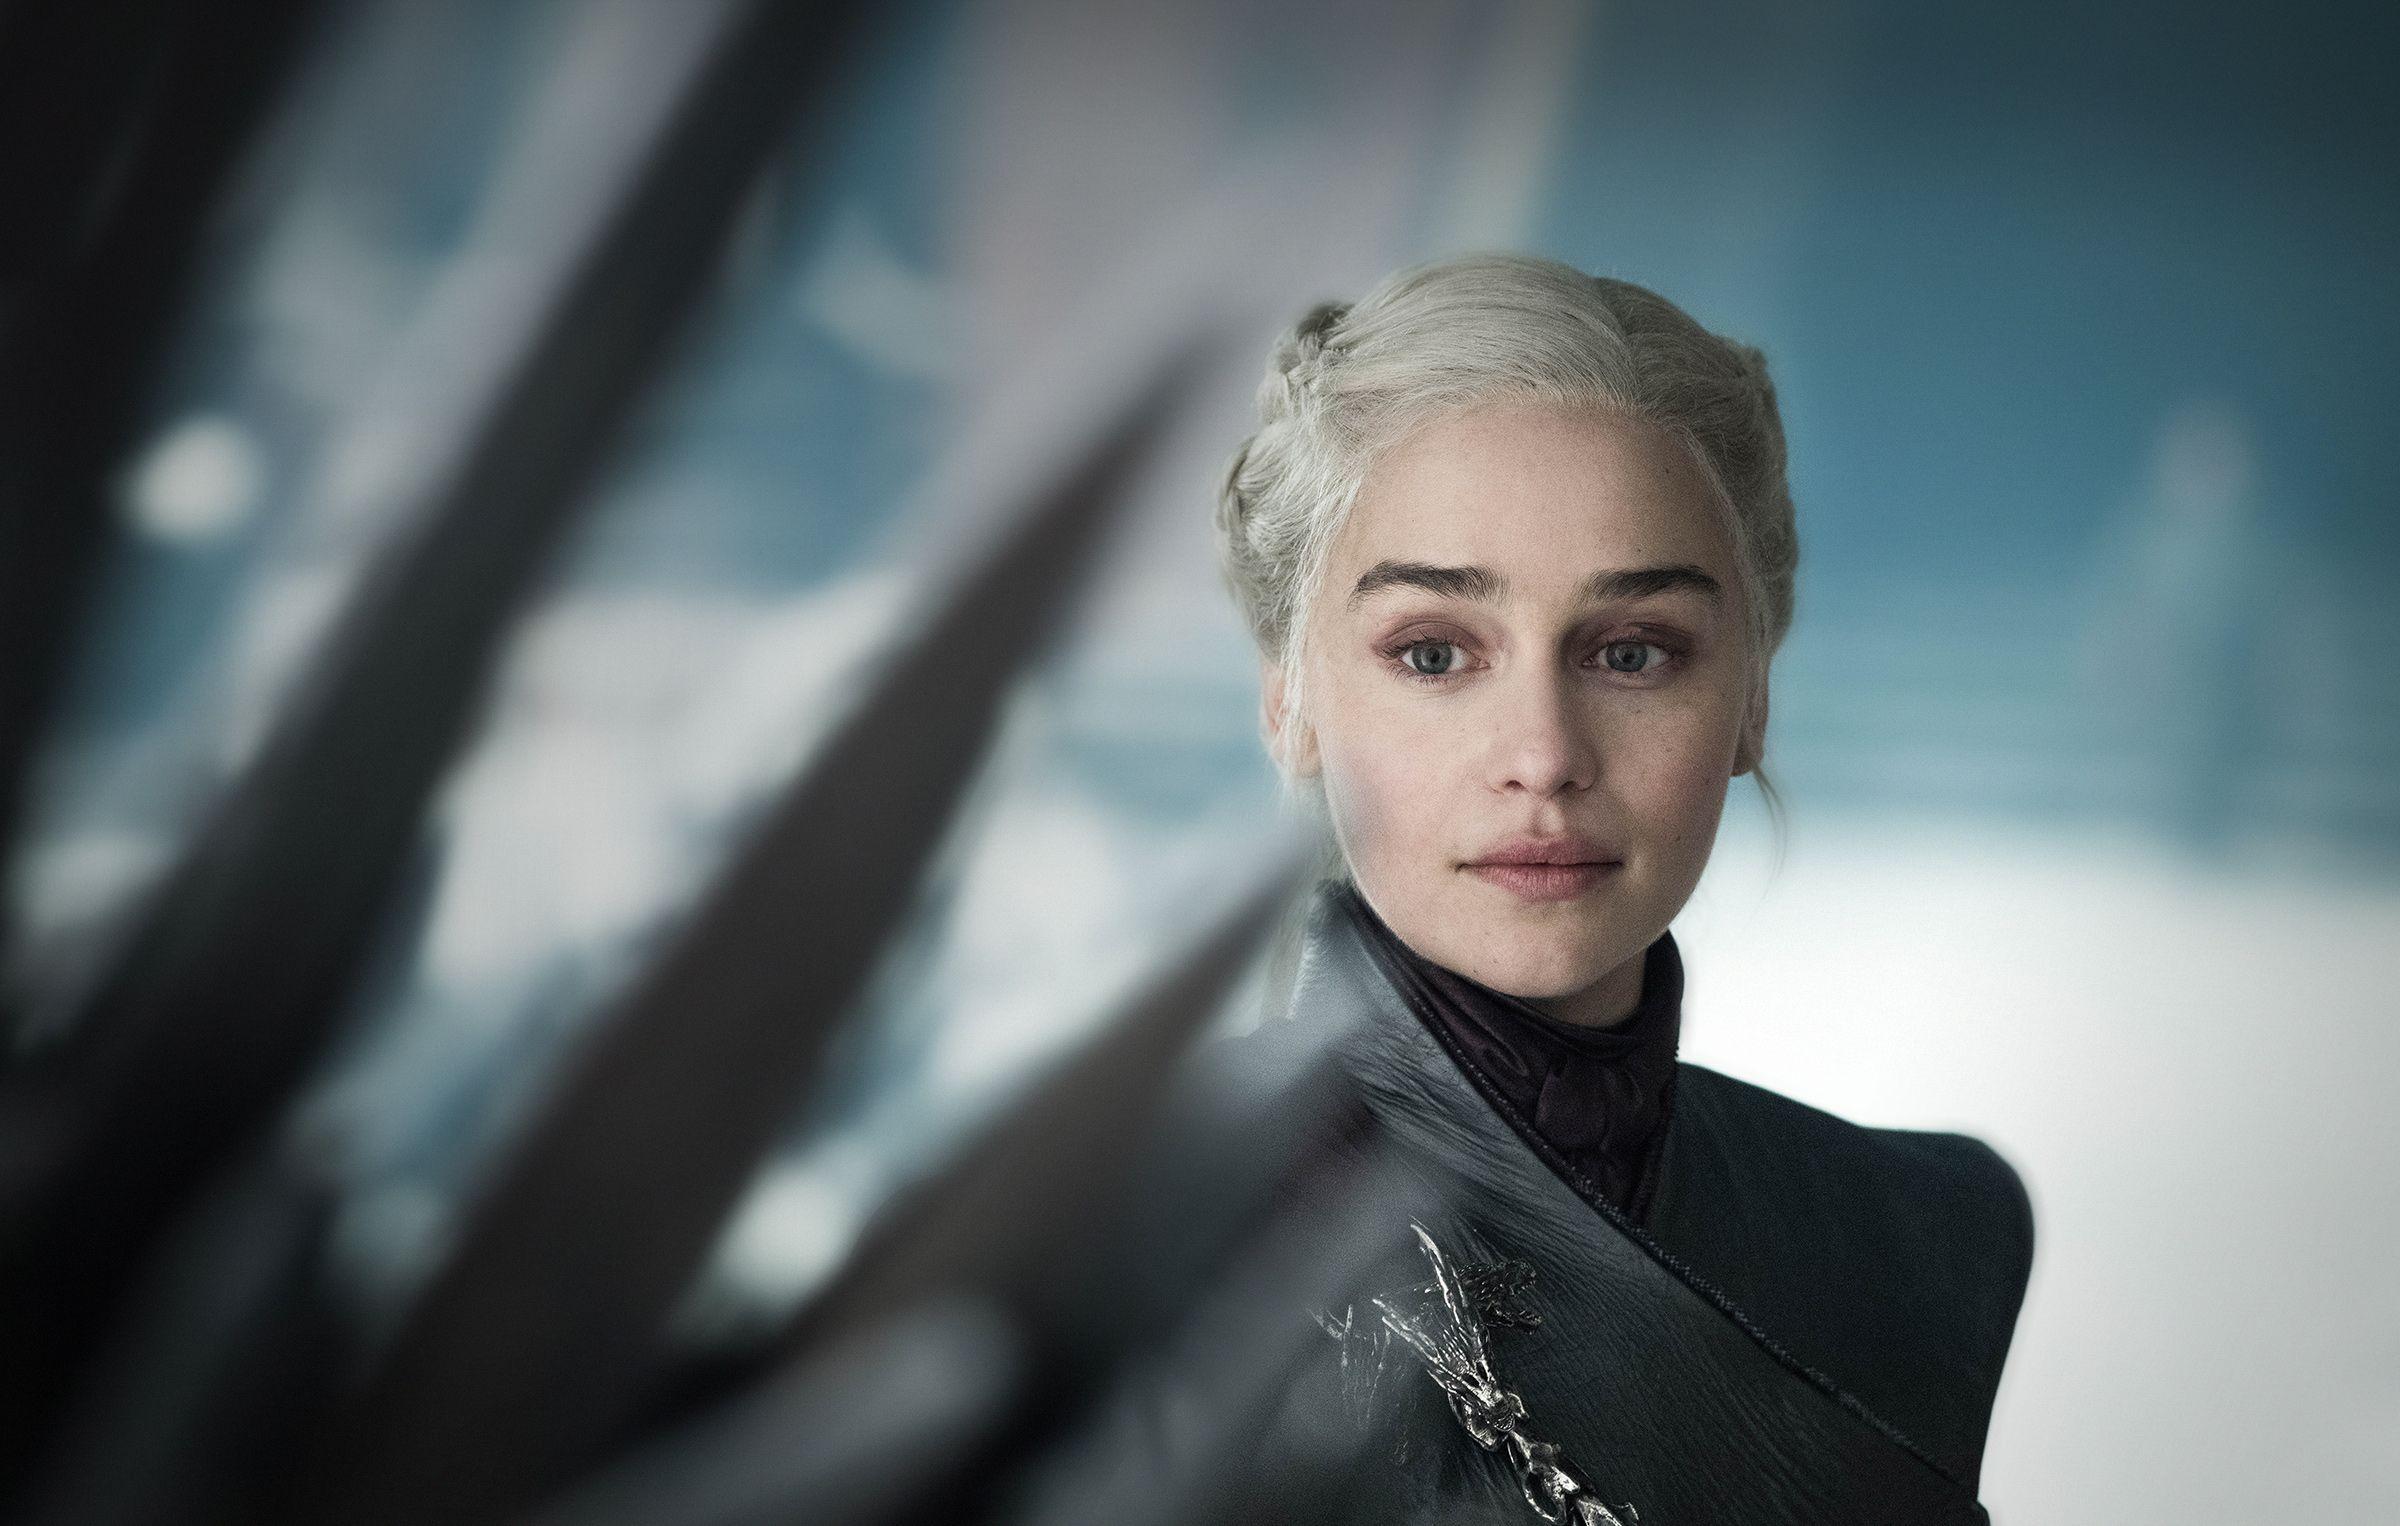 Daenerys looking at throne